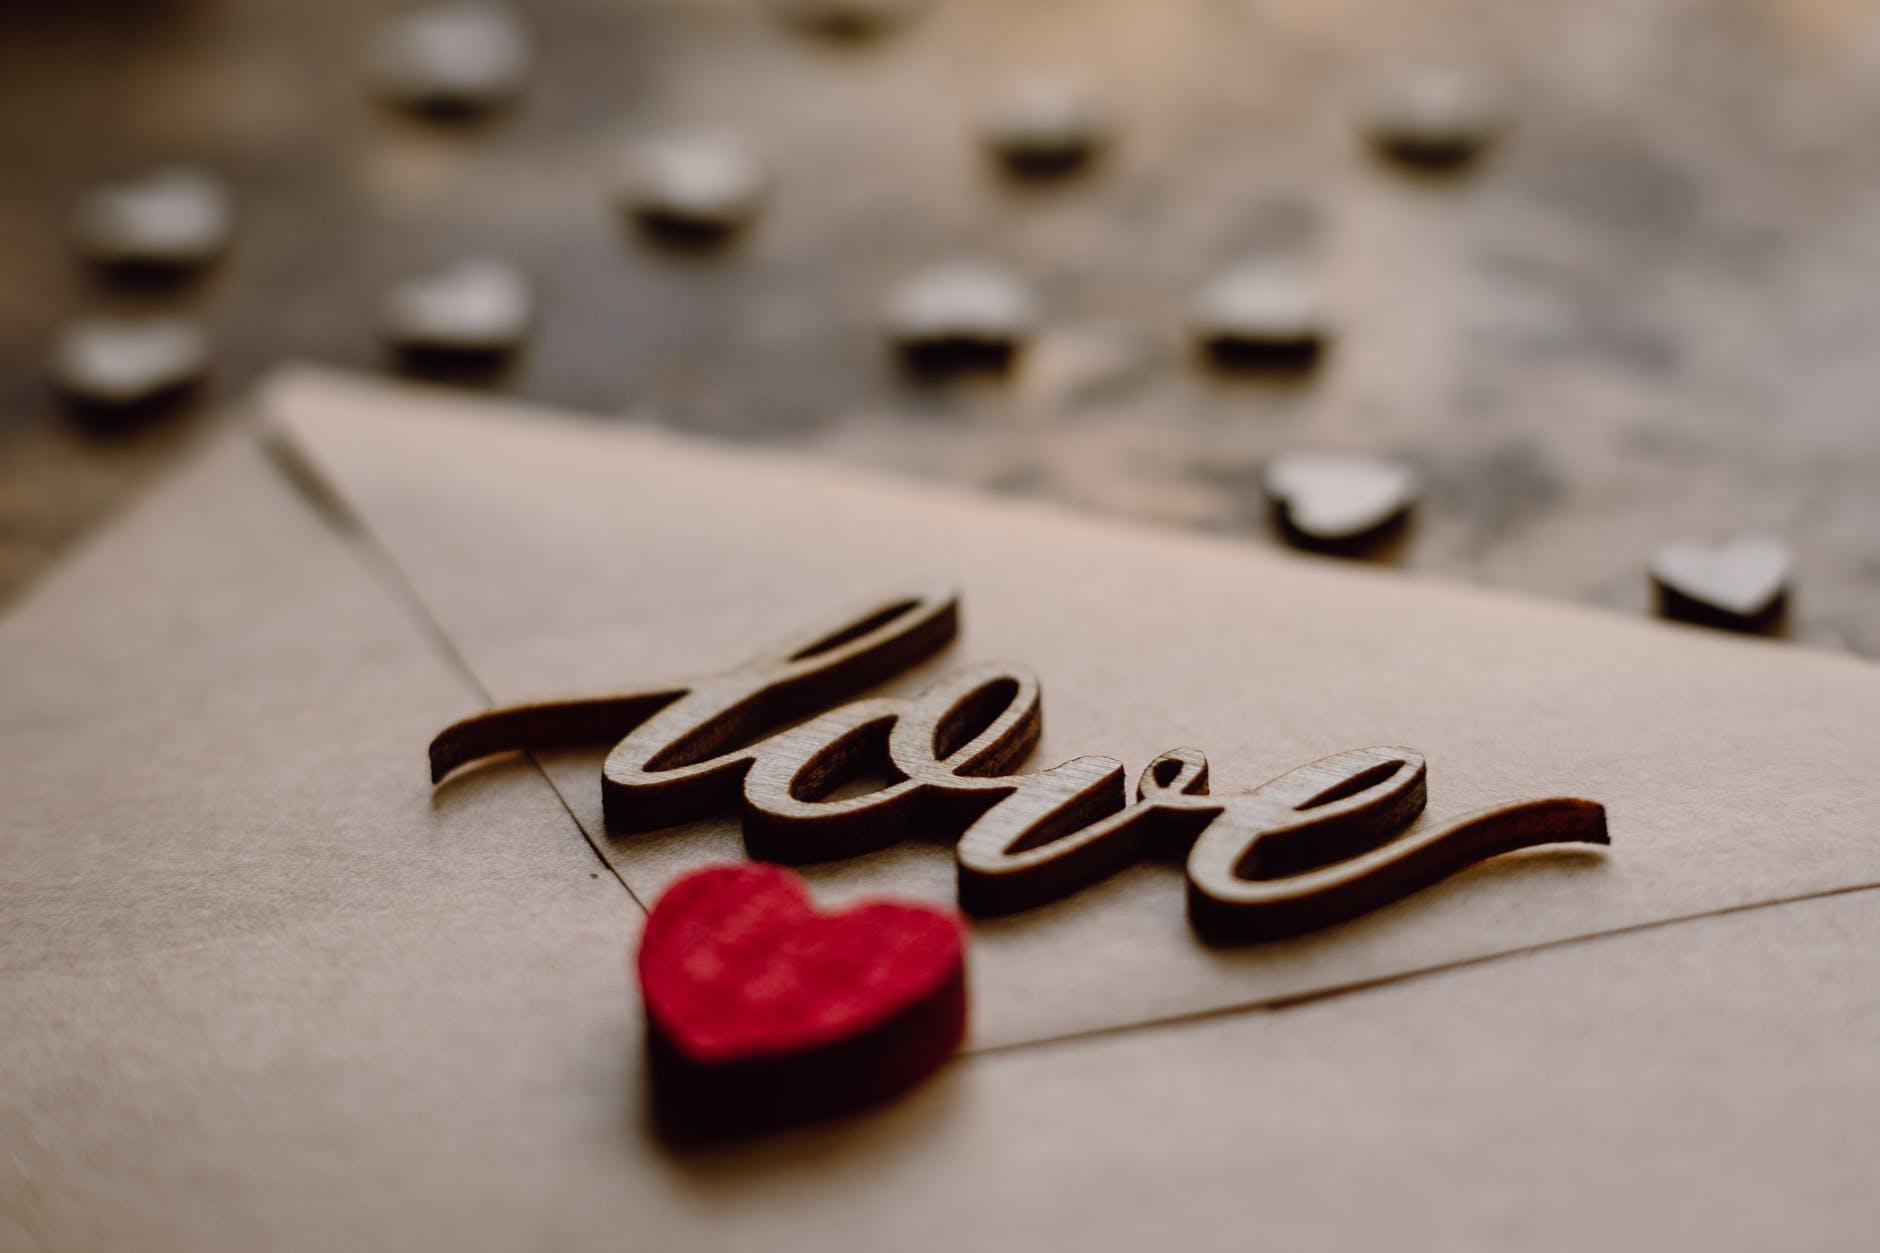 Dvanaest vrsta ljubavi. Koja božica vlada vašom Venerom?